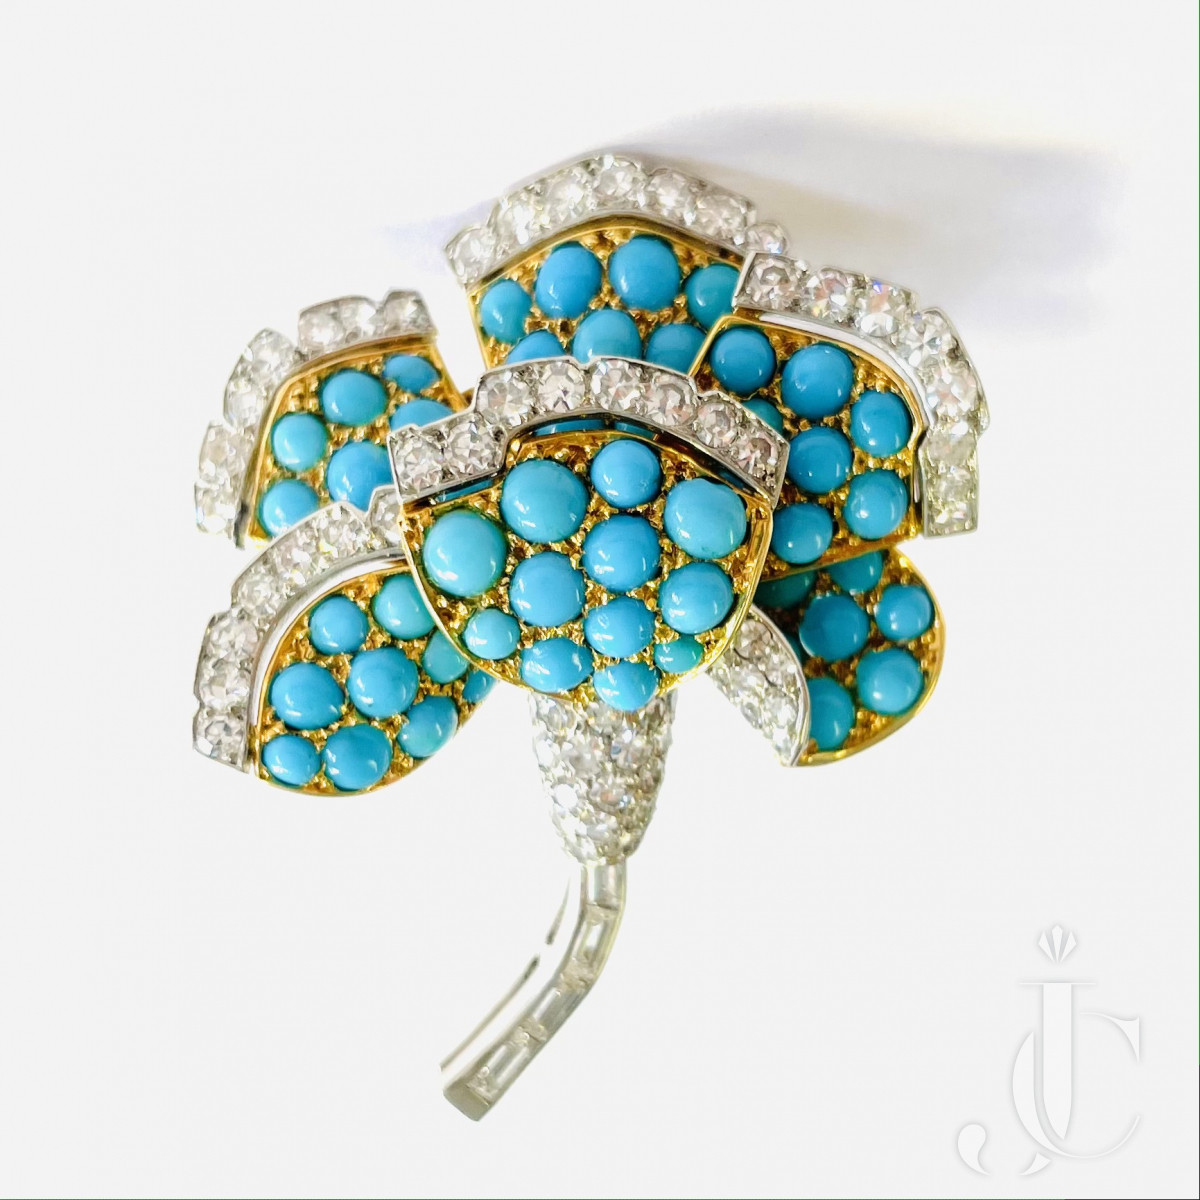 Cartier Turquoise Diamond Brooch